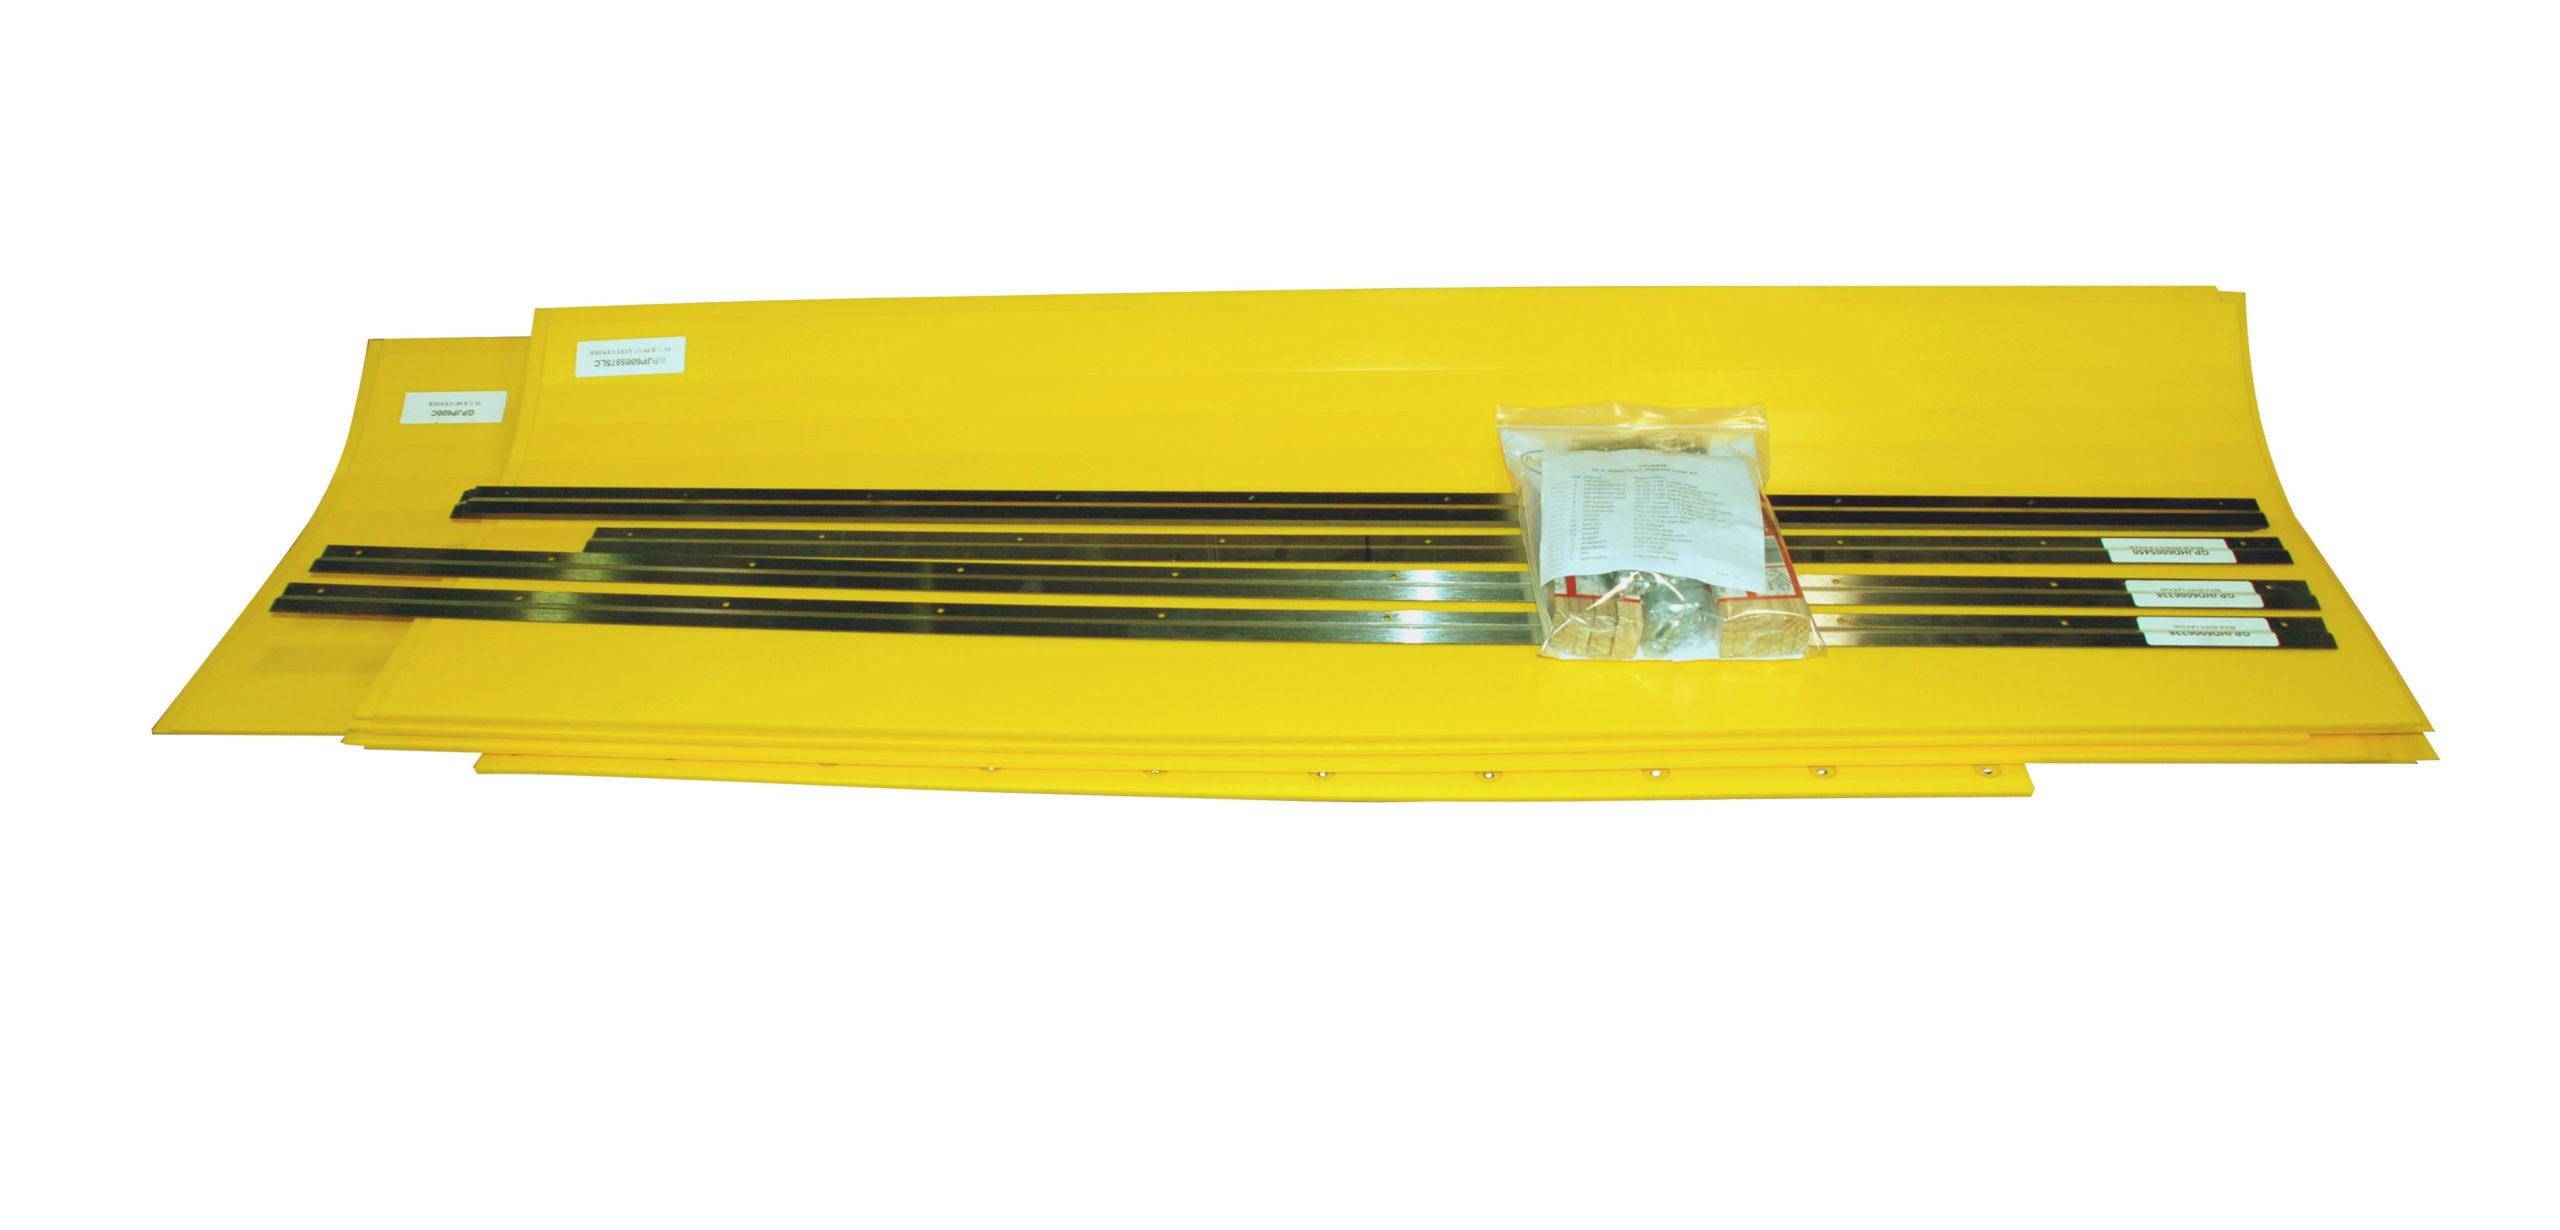 John Deere 600 Series 30' Flex Poly Grain Platform Liner